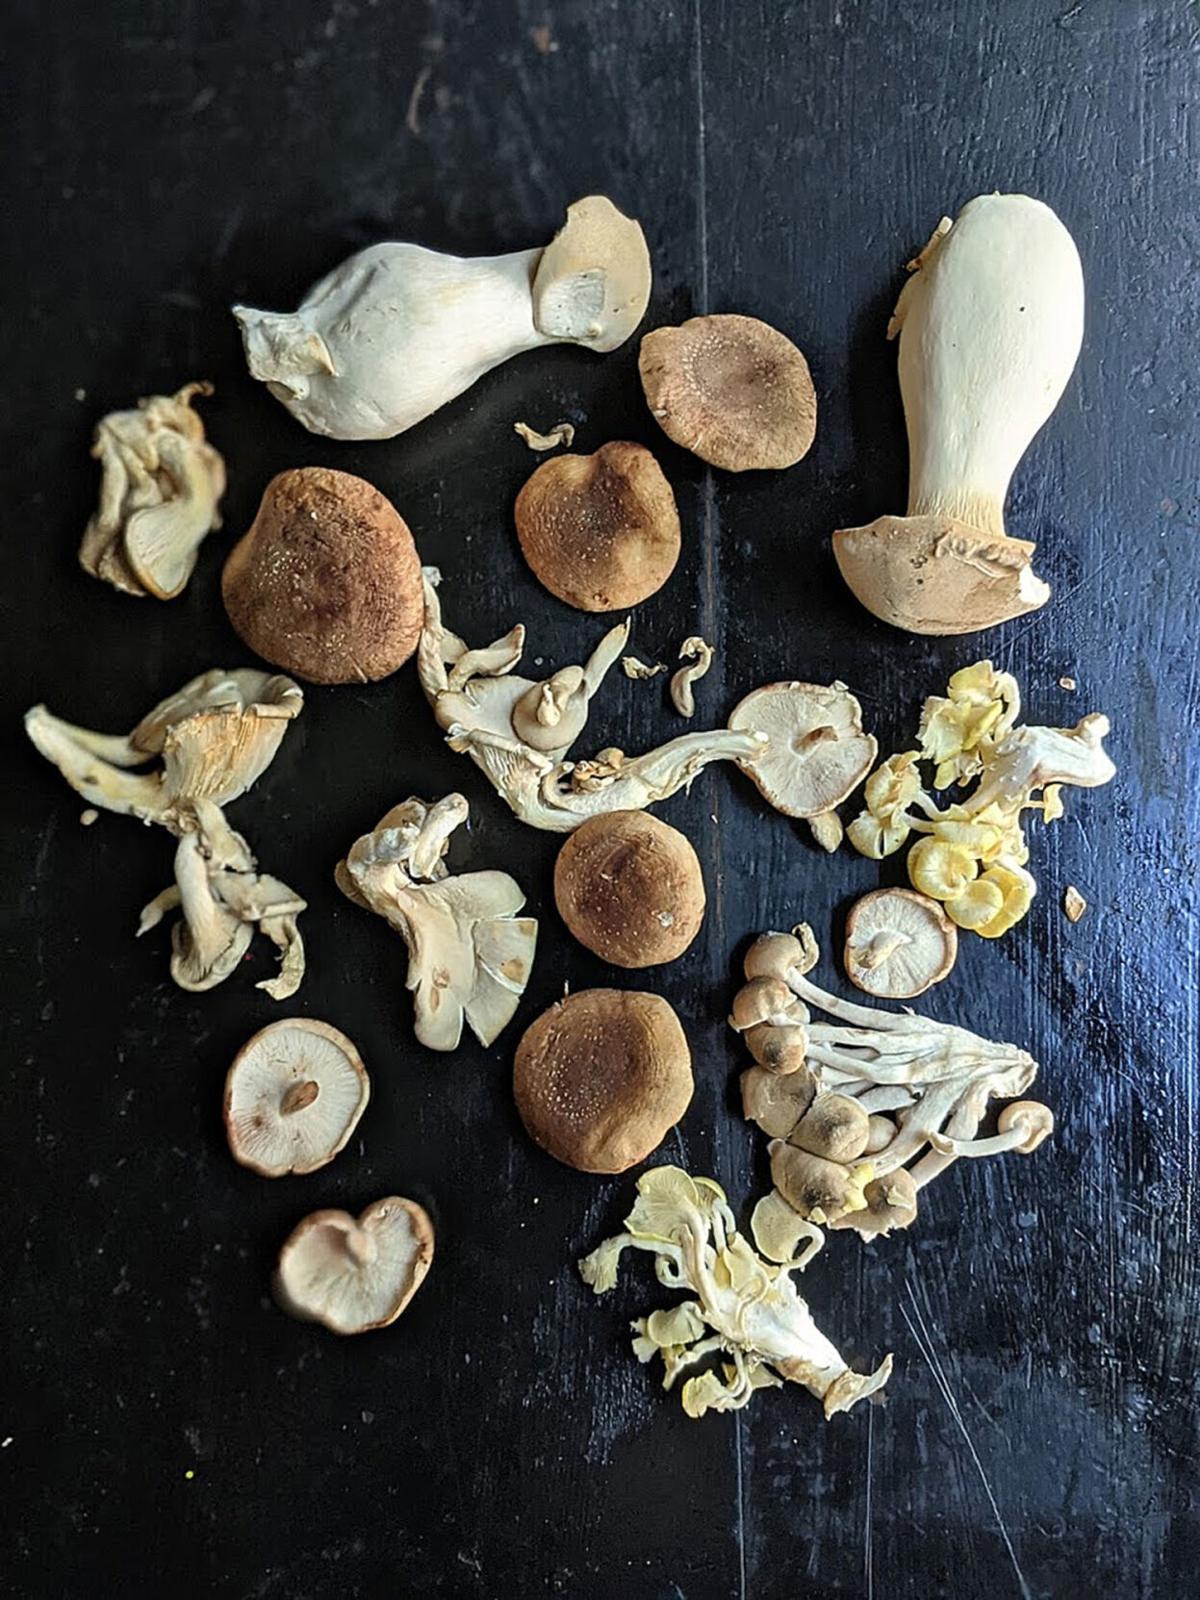 What fungi!